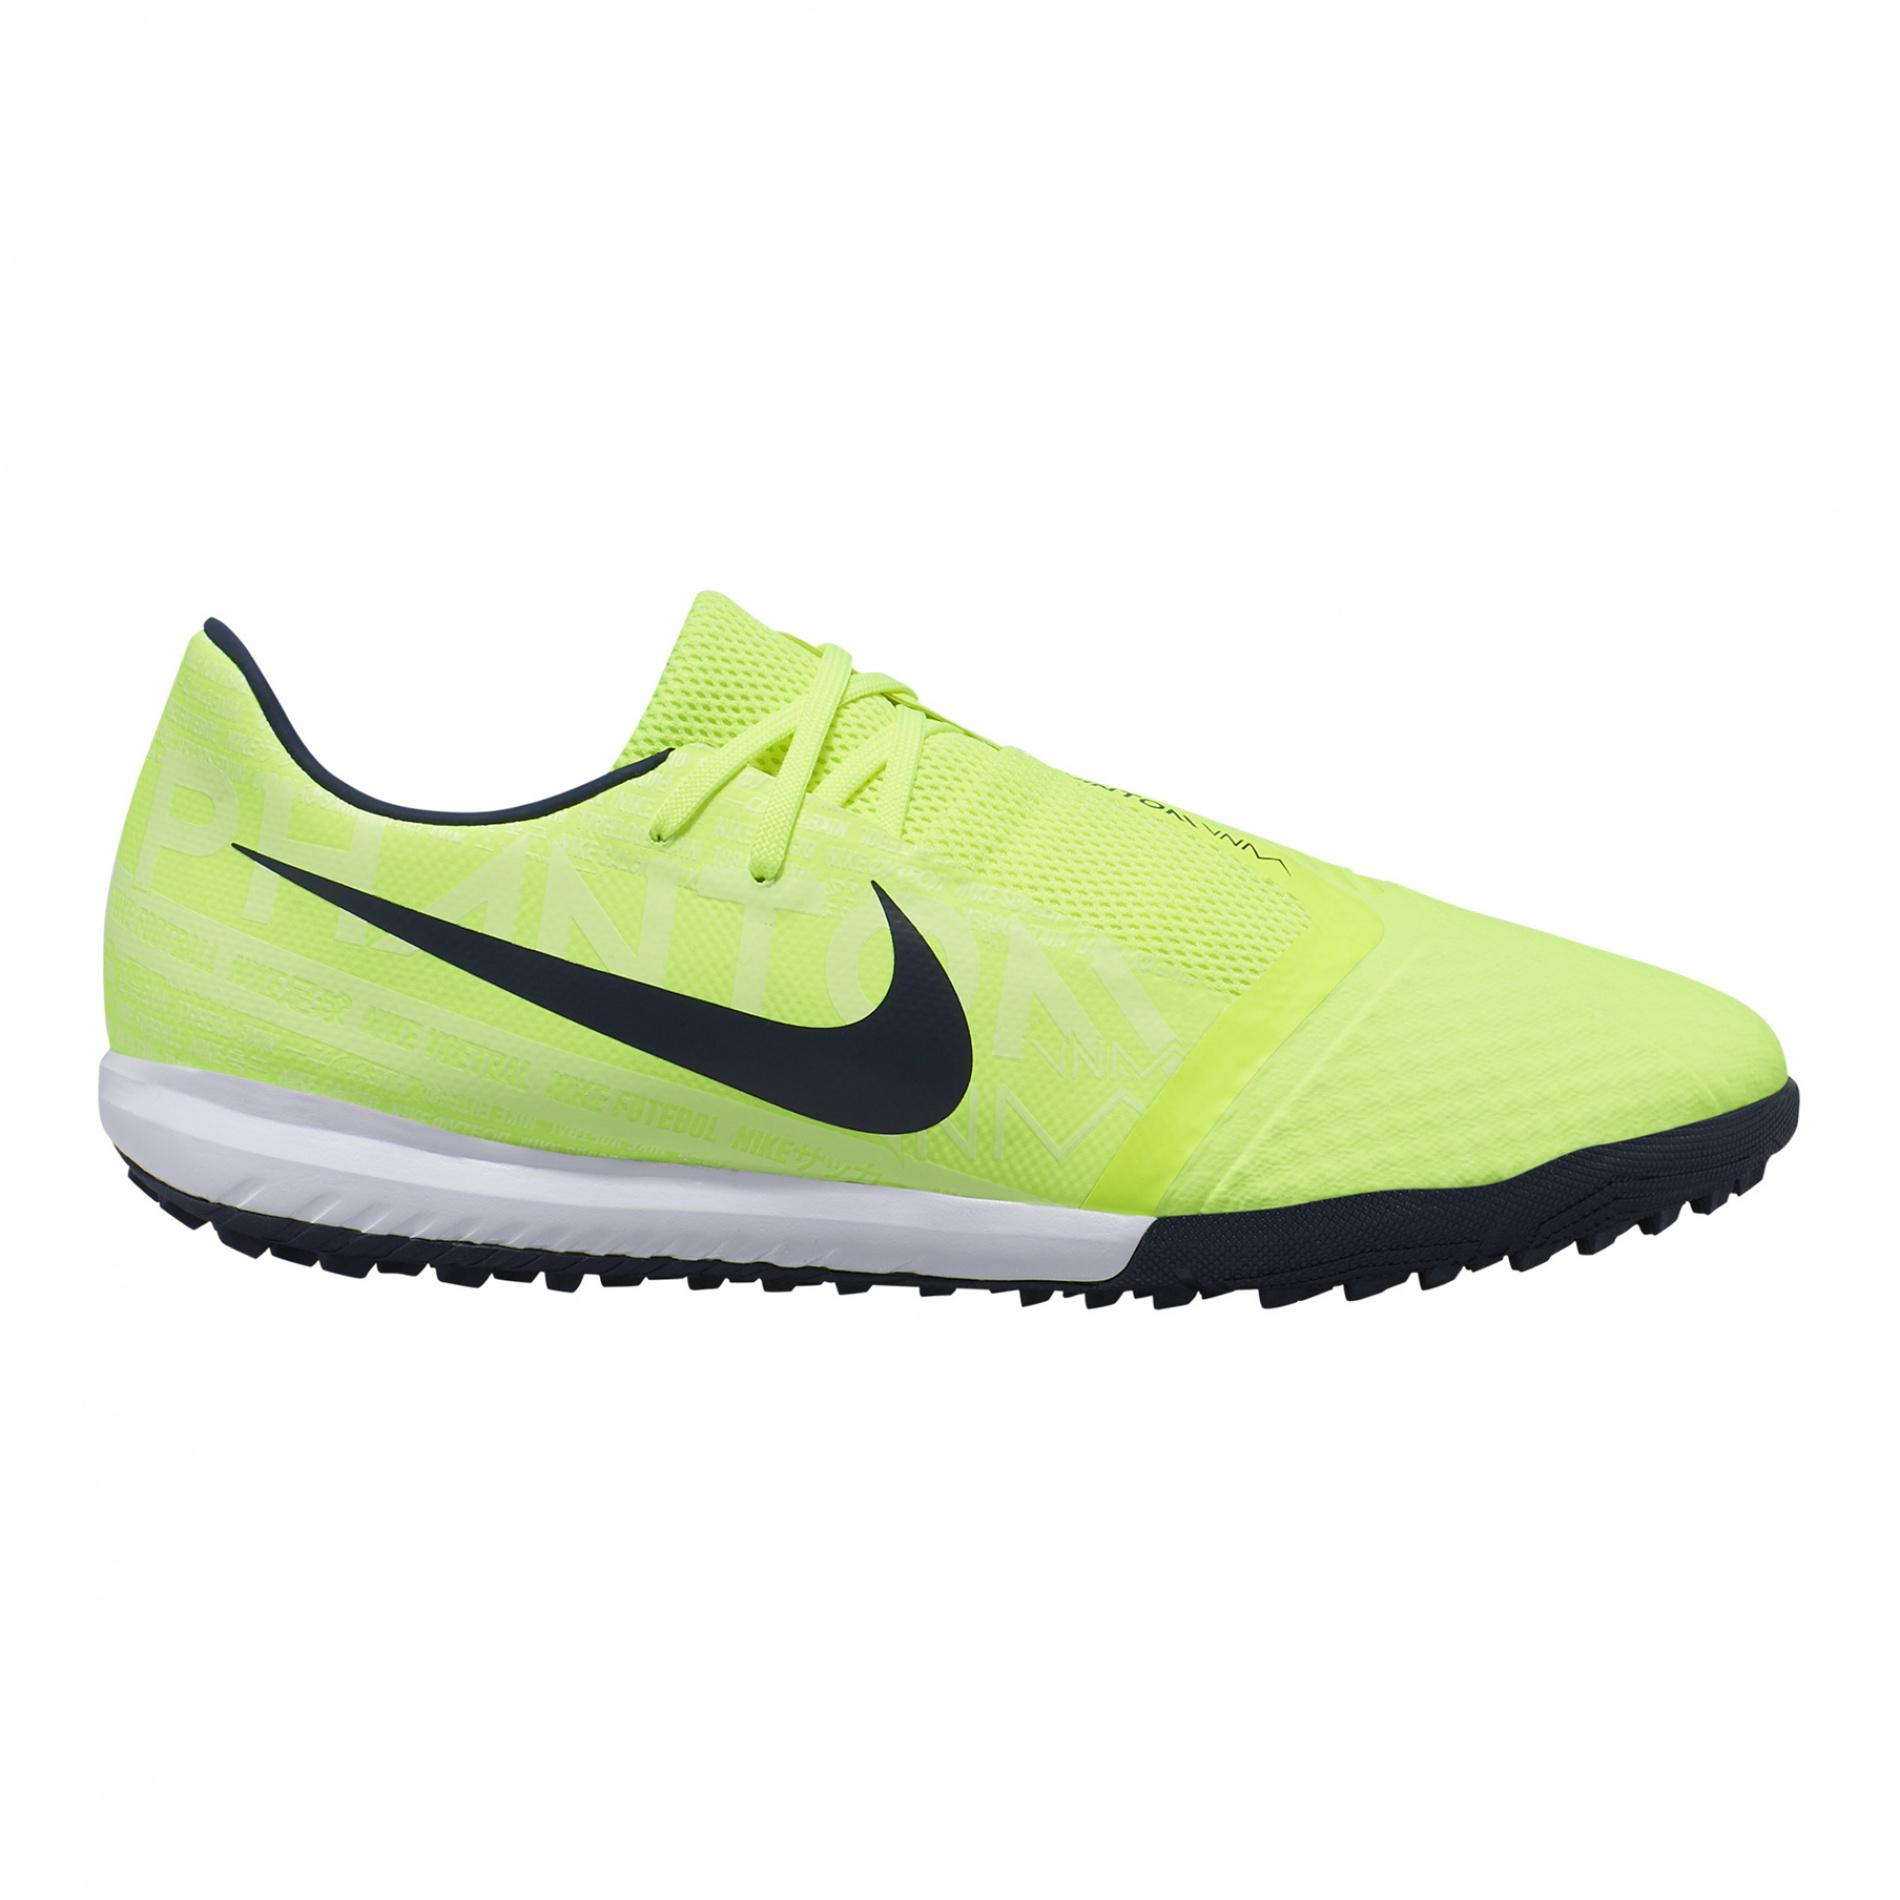 Nike Phantom VNM Academy TF AO0571 717